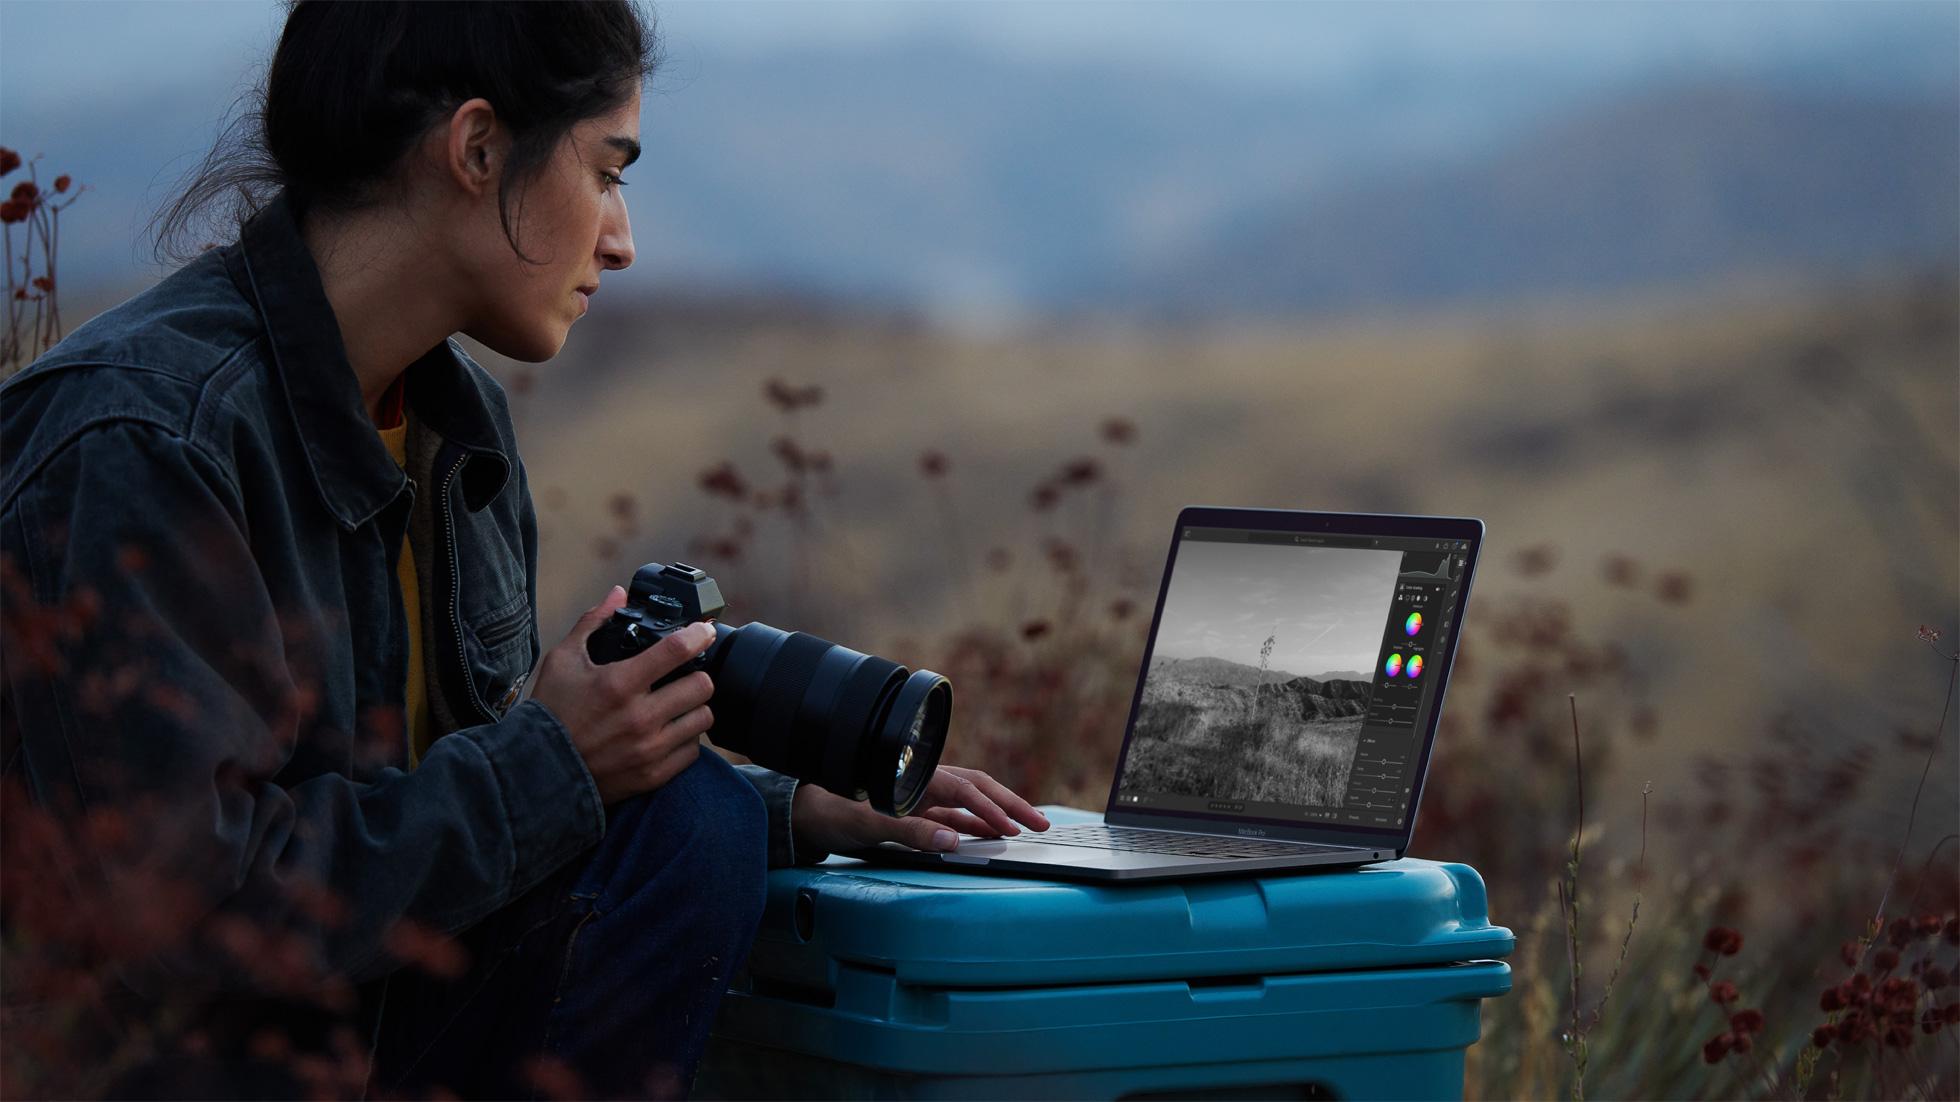 Apple_new-macbookpro-photographer-photo_11102020.jpg